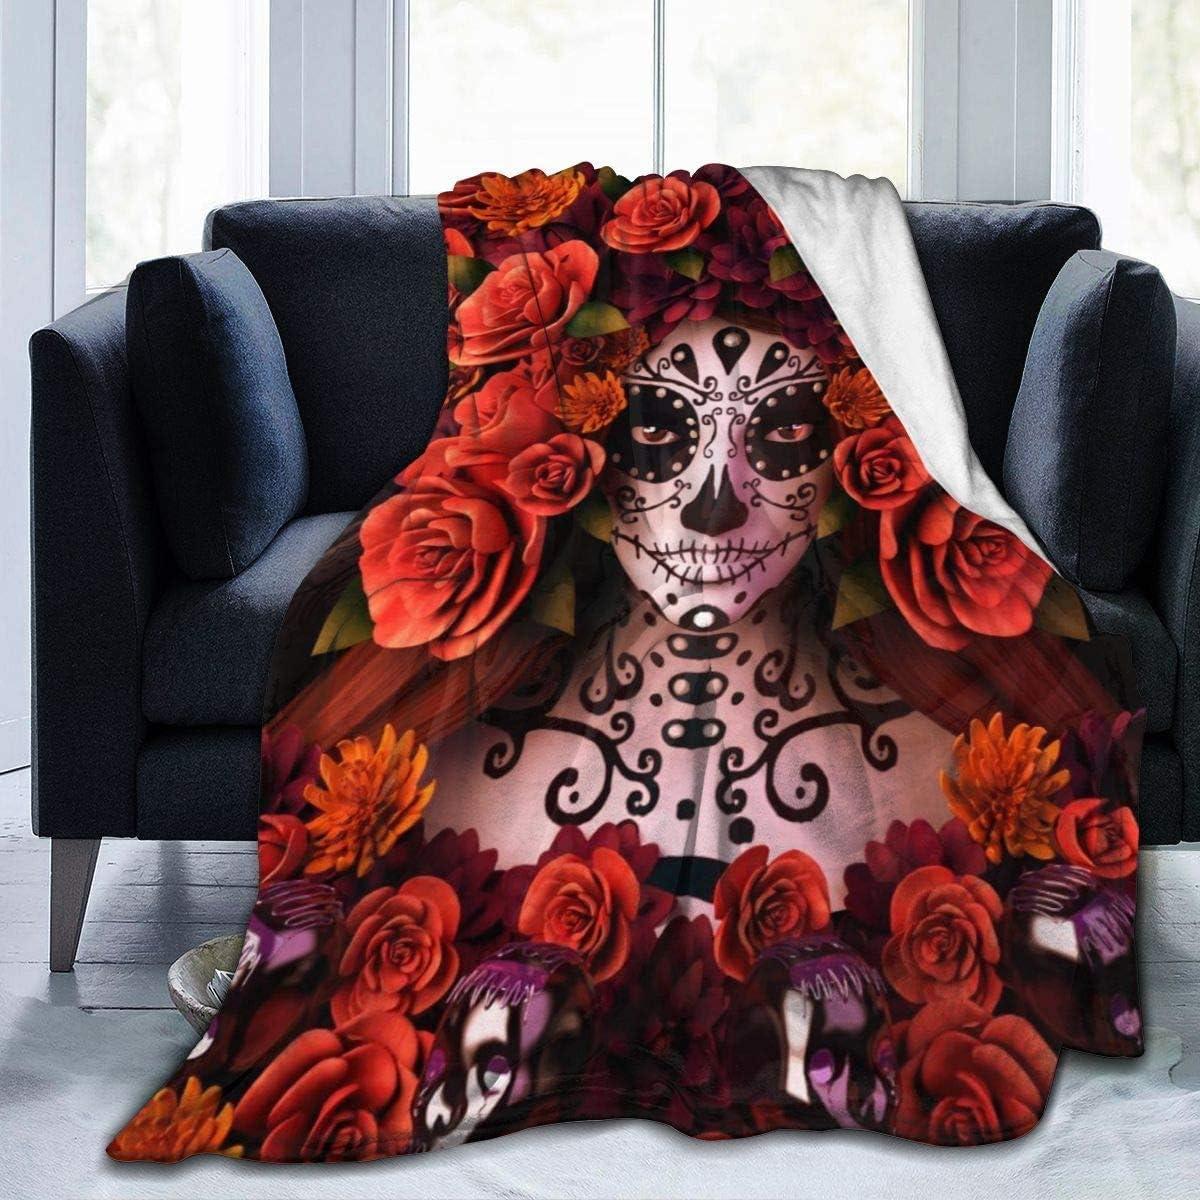 Limited time for free shipping Sugar Skulls Roses Day Of Dead Elegant Blanke Halloween - Fleece Flannel